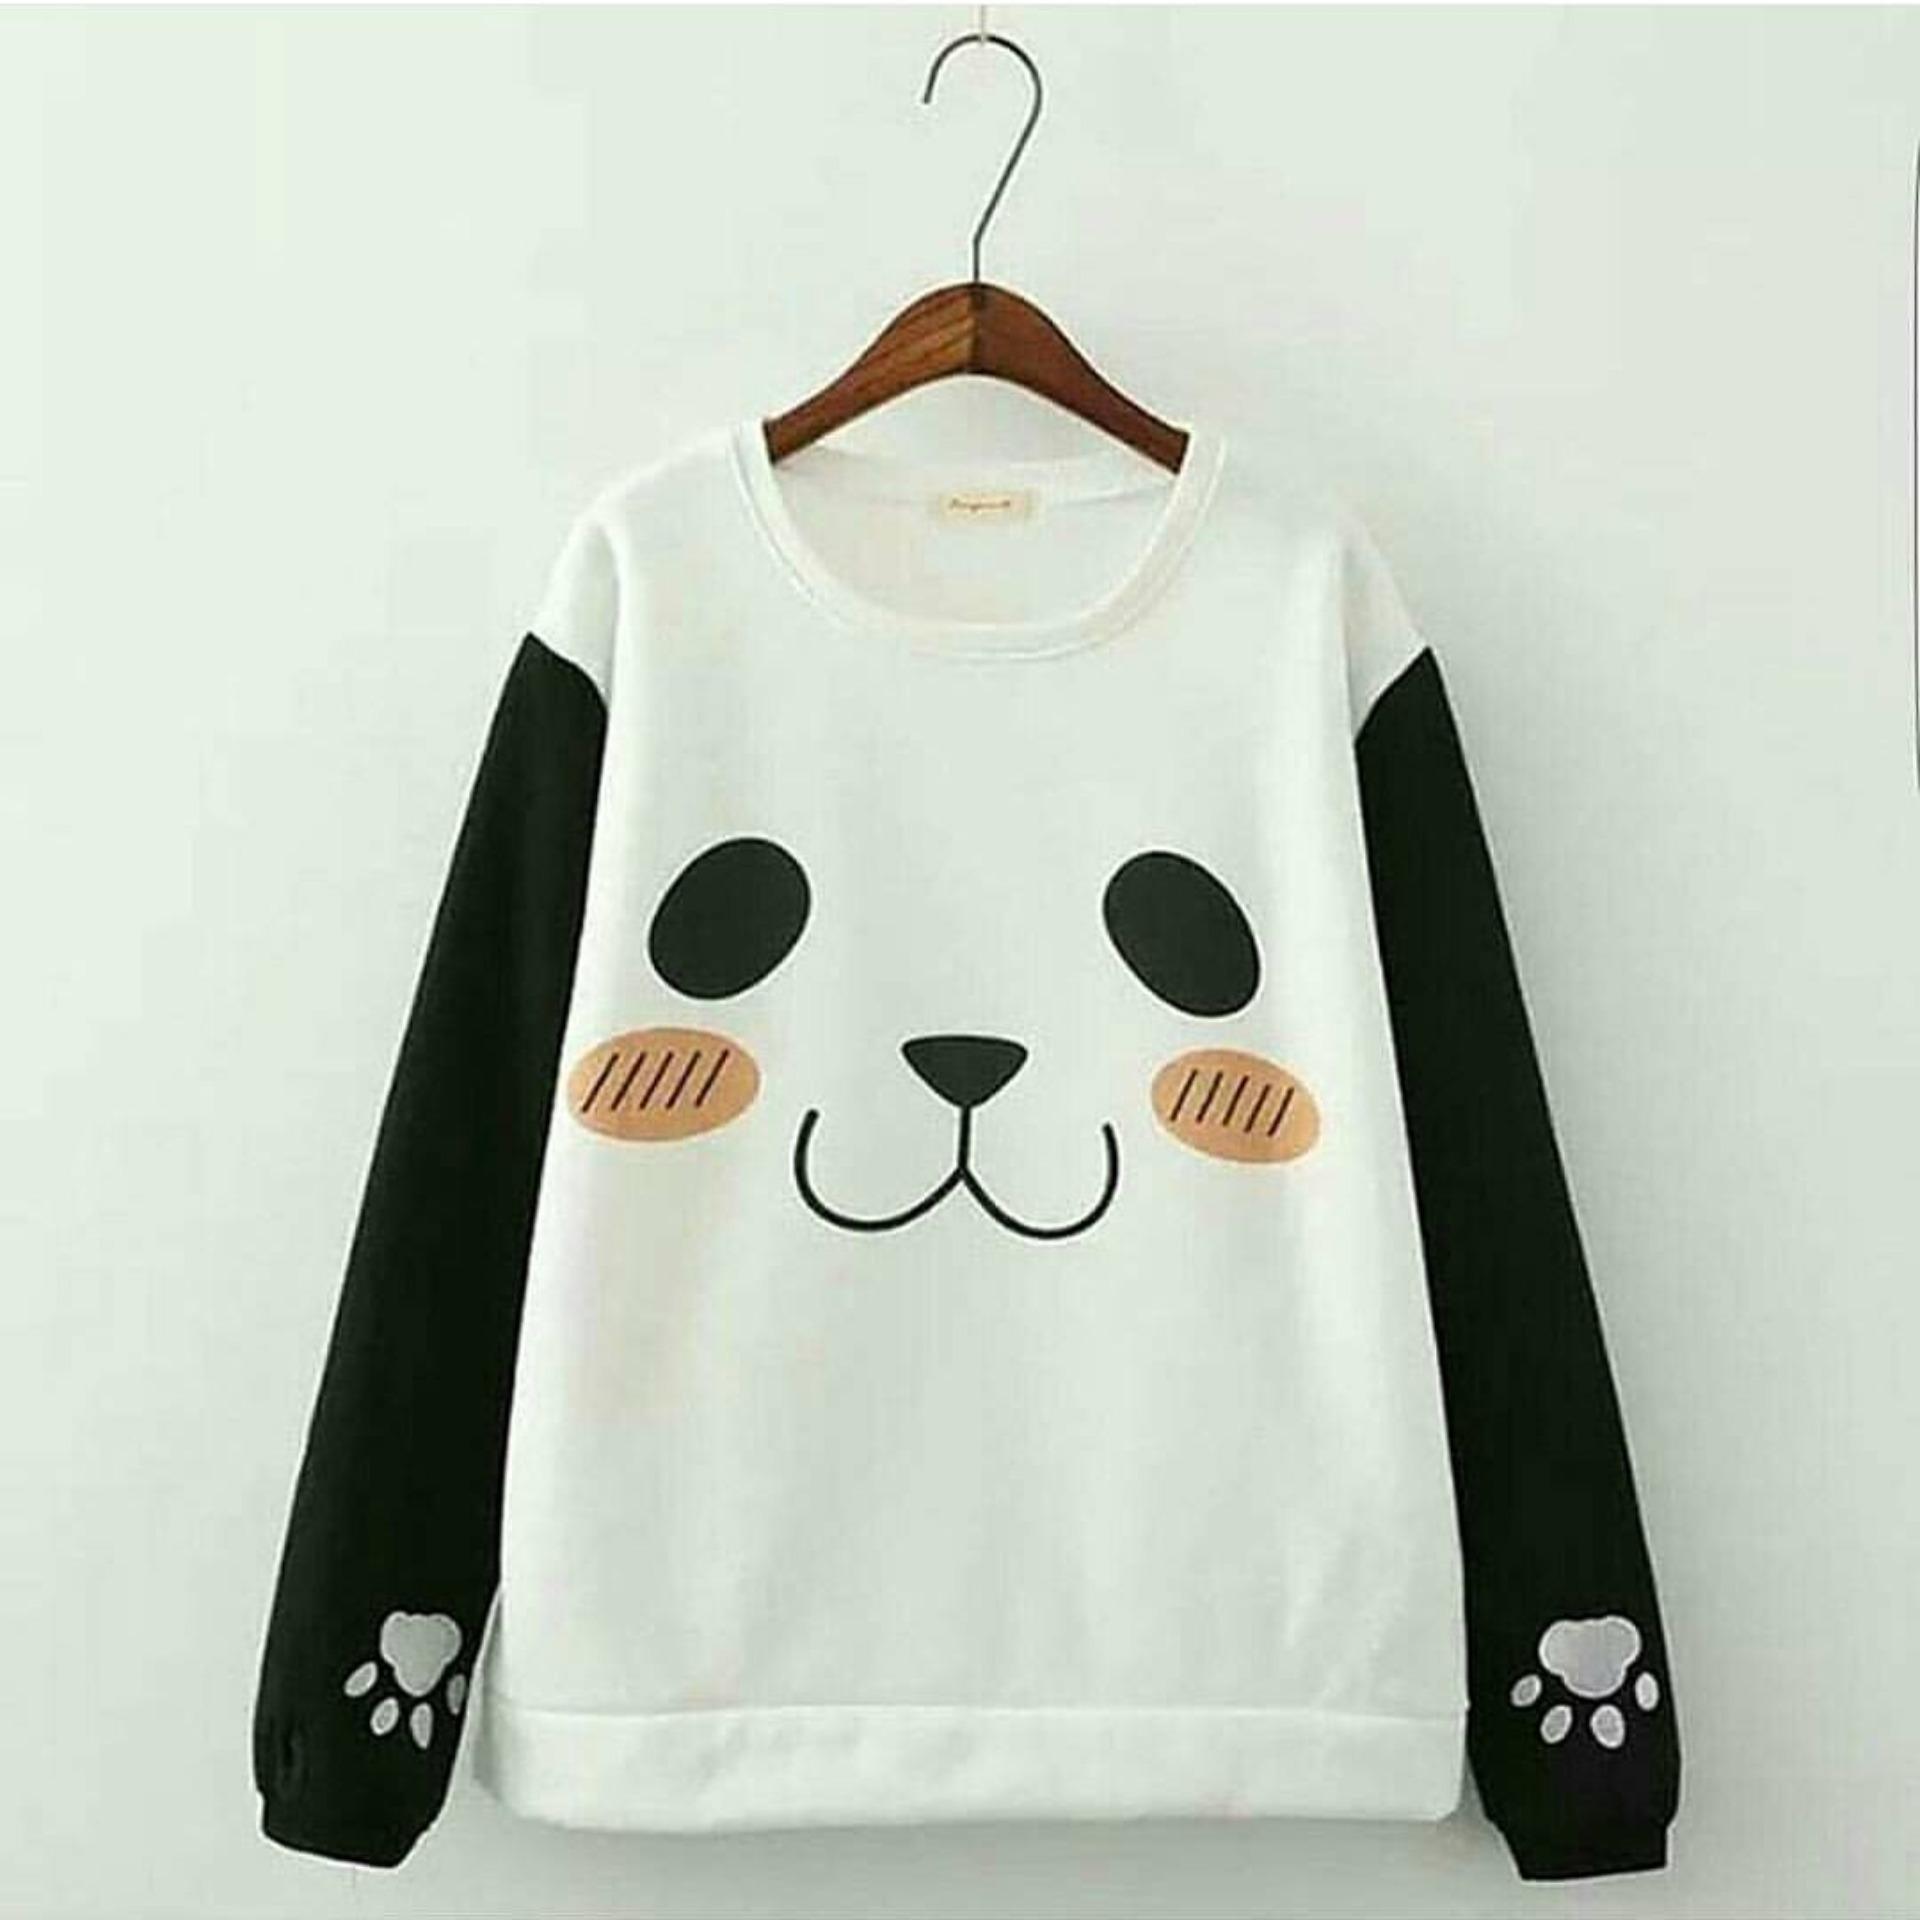 Baju Original Panda Roundhand Sweater Babytery Jaket Muslimah Hangat Fleece Misty Combie Babyterry Zipper Hoodie Casual Jacket Atasan Wanita